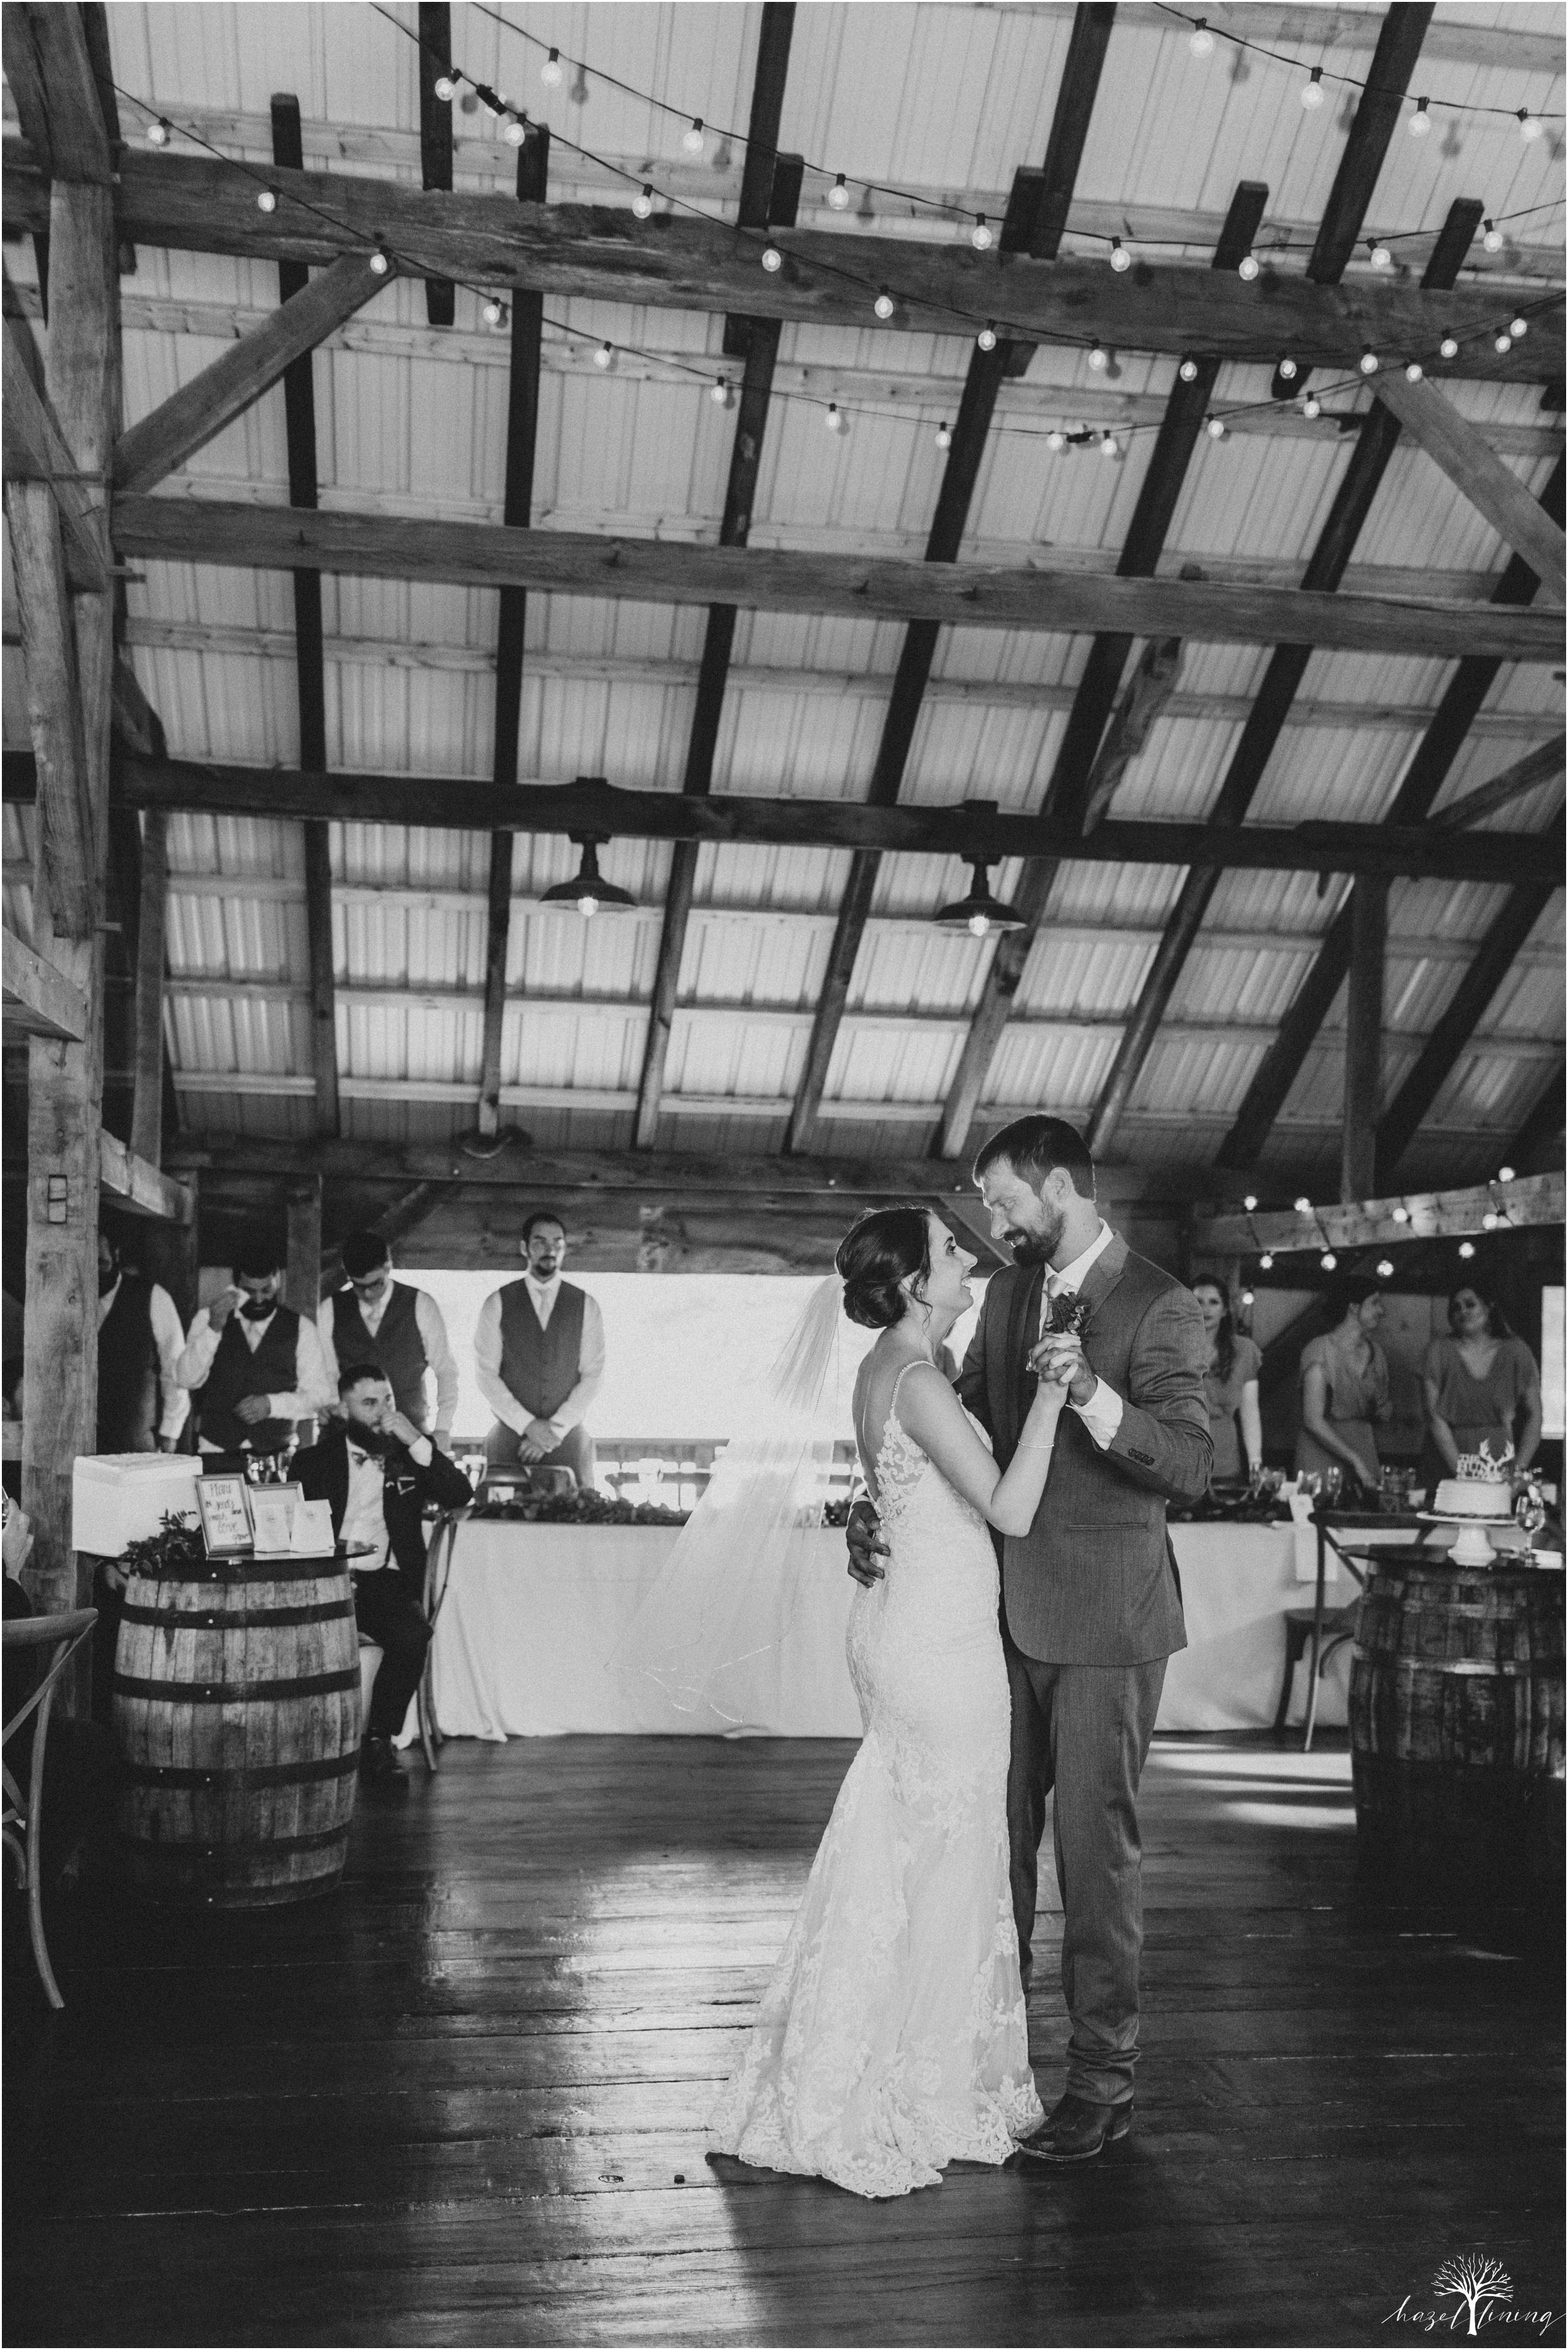 hazel-lining-travel-wedding-elopement-photography-lisa-landon-shoemaker-the-farm-bakery-and-events-bucks-county-quakertown-pennsylvania-summer-country-outdoor-farm-wedding_0115.jpg